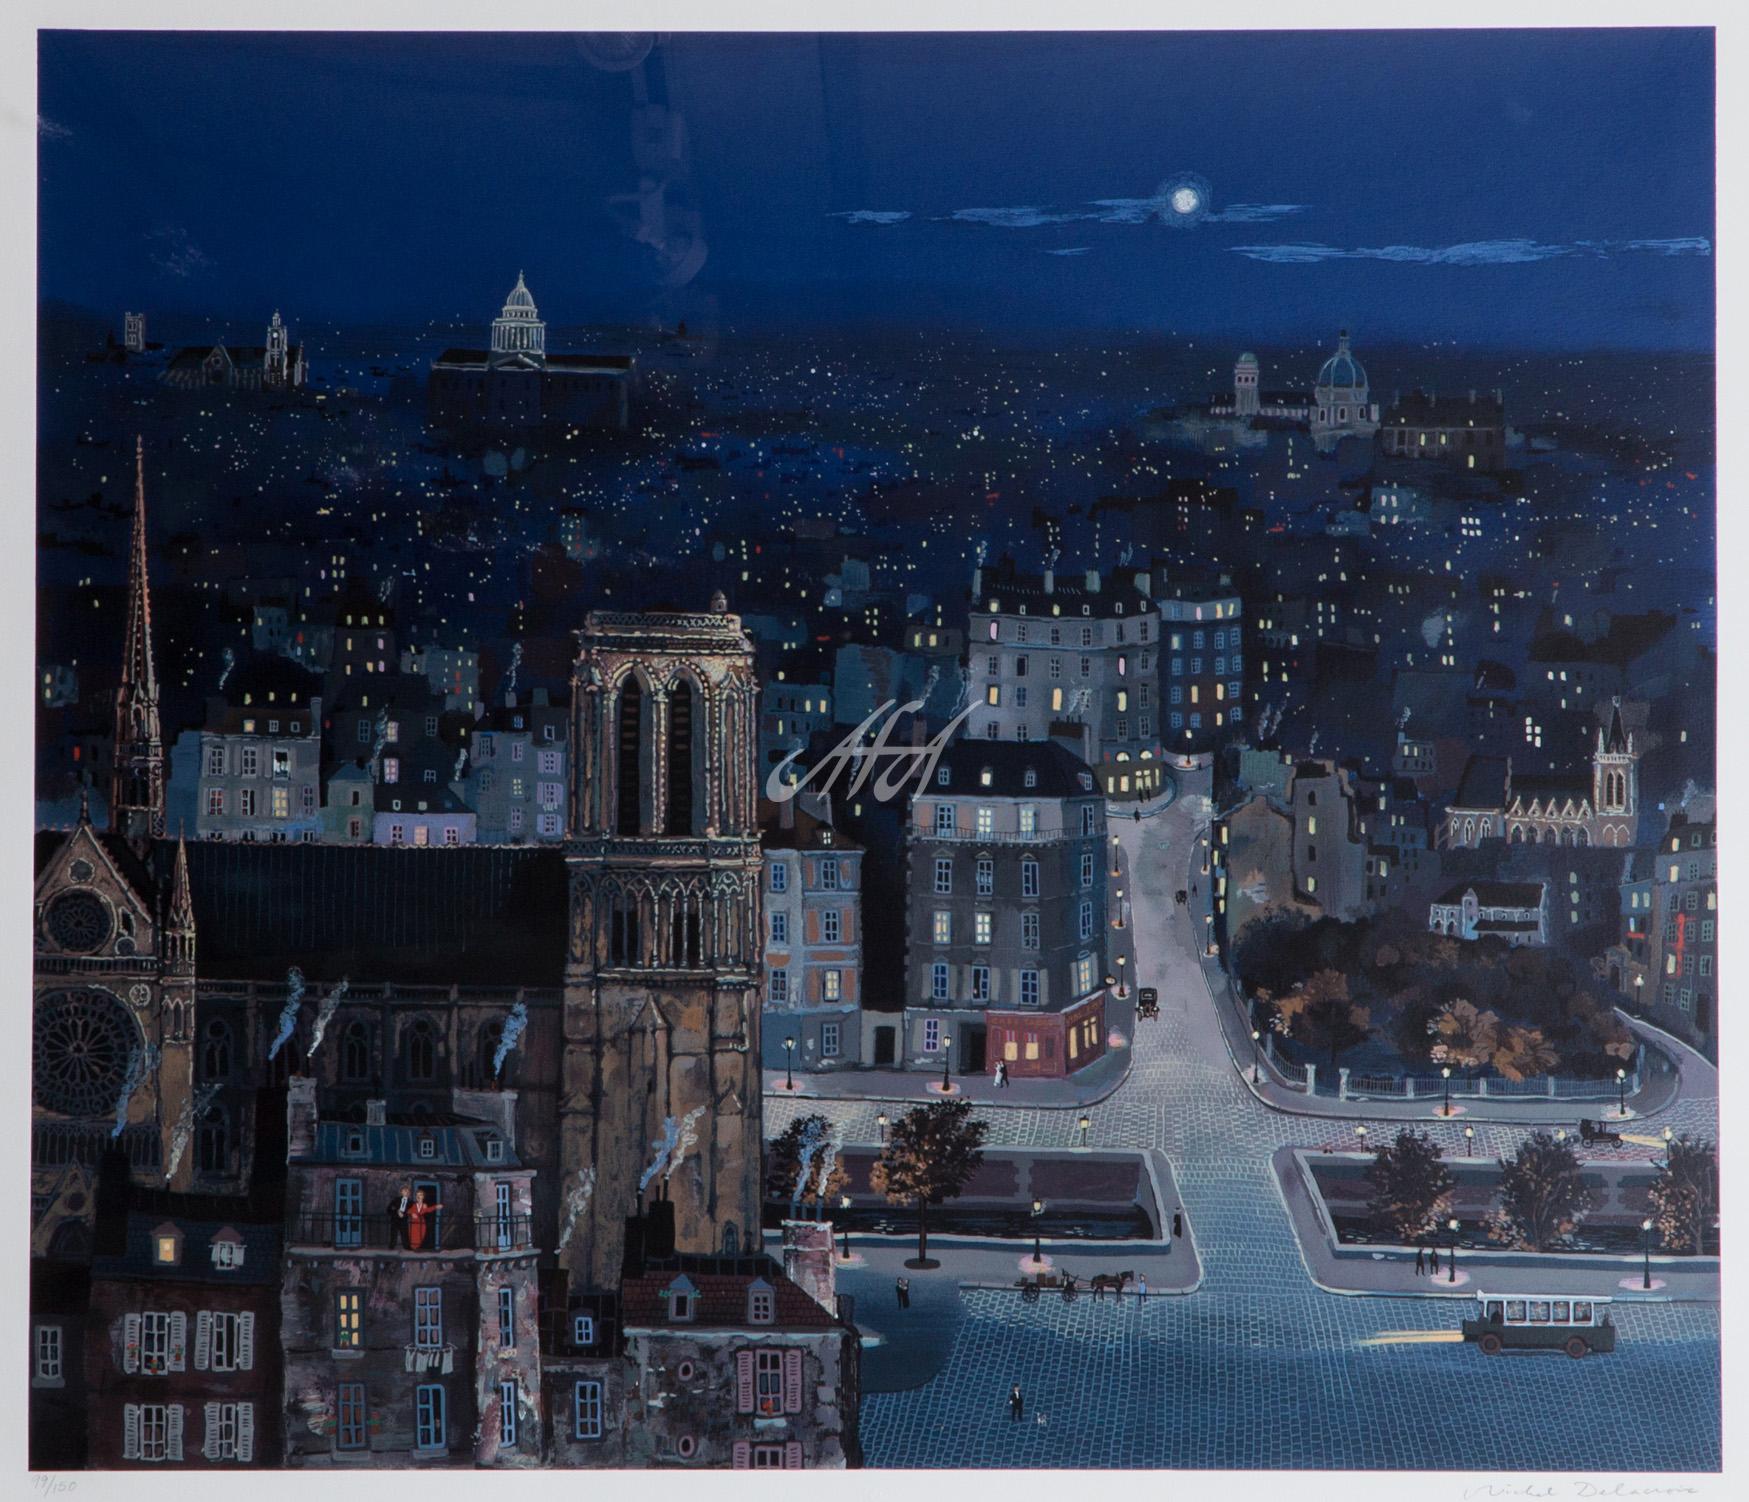 Michel_Delacroix_Paris1 UNF watermark.jpg